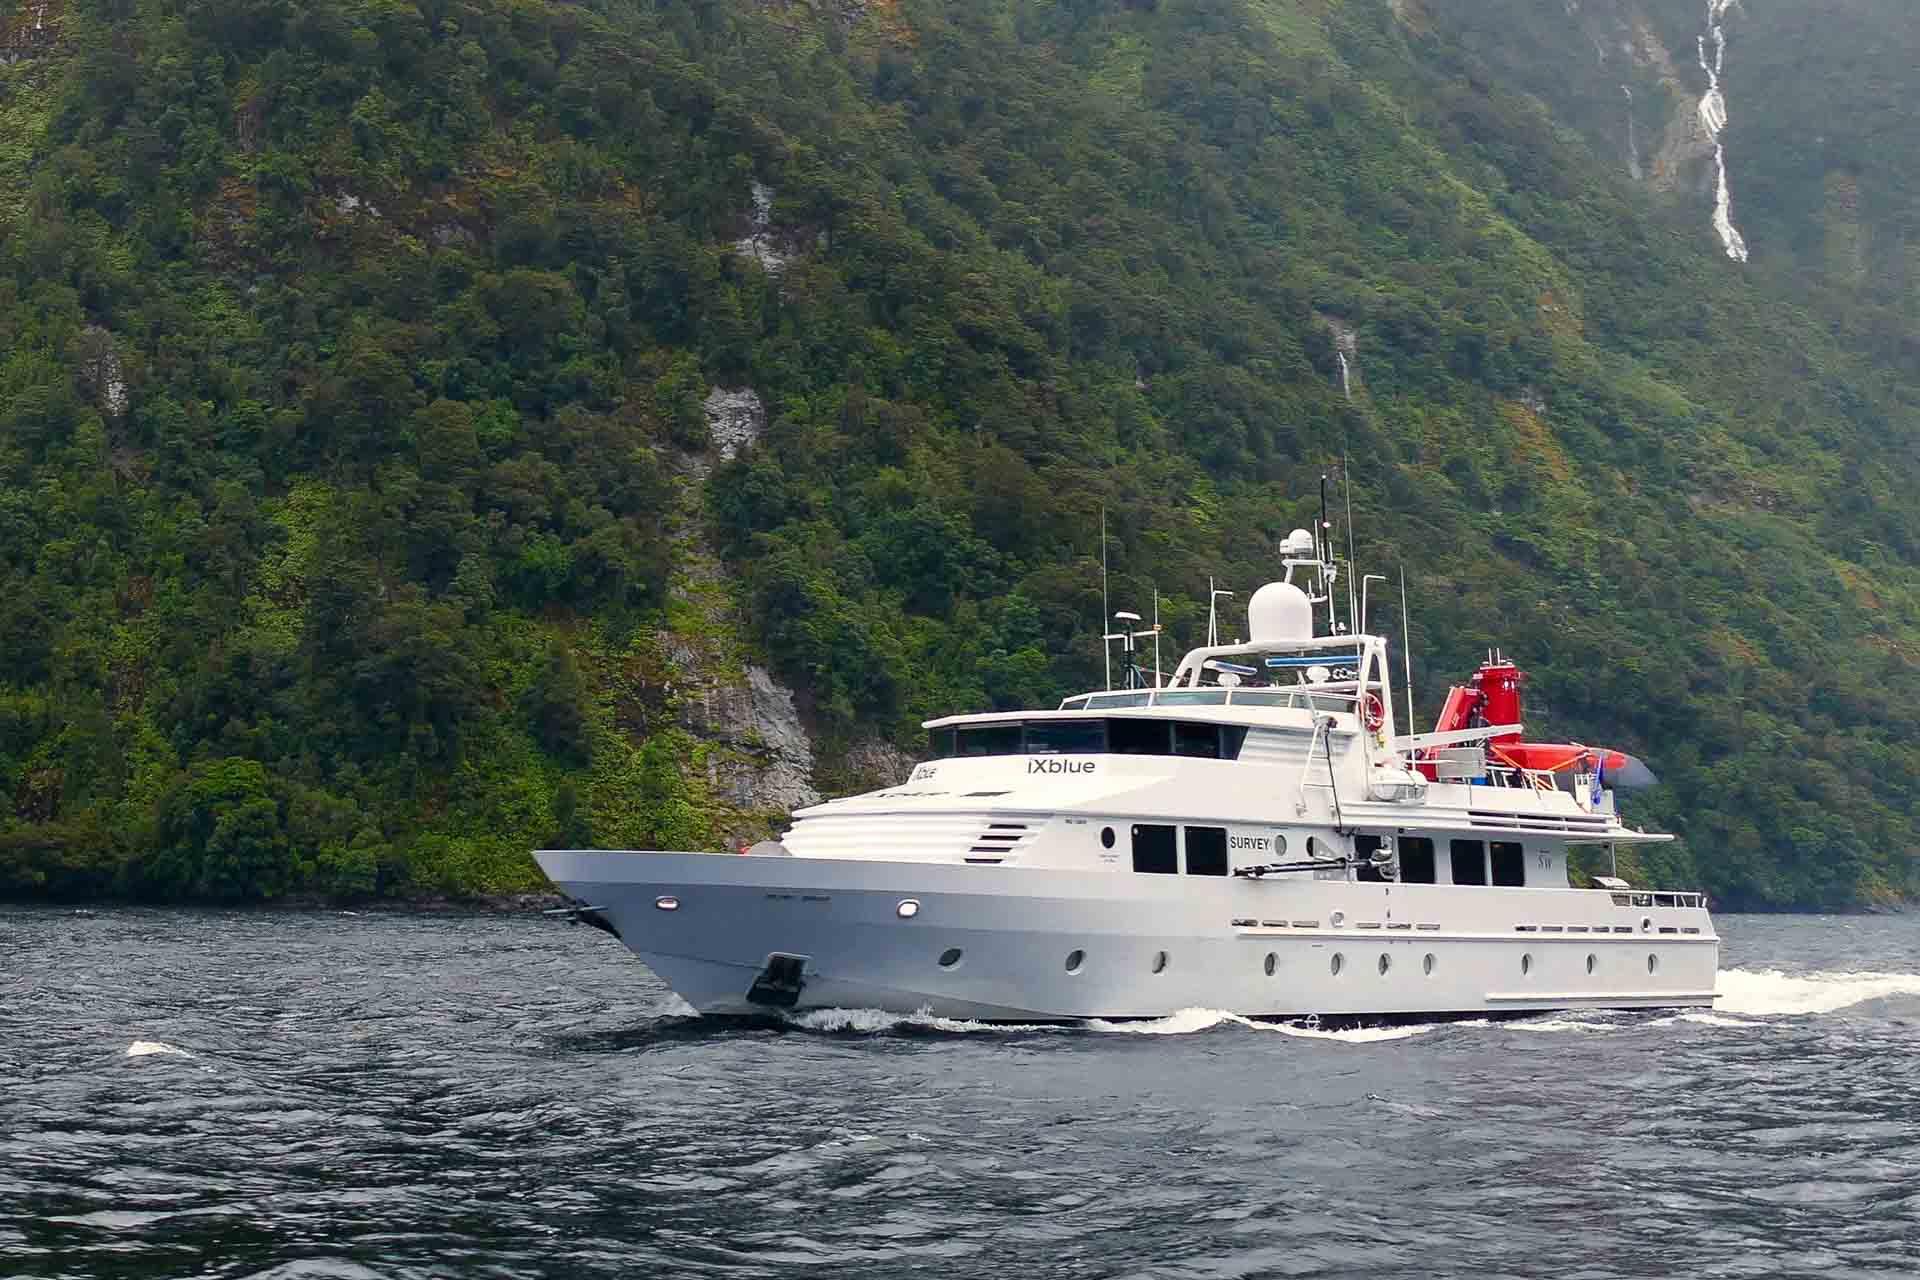 Pacific7 luxury offshore workboat - Fiordland - new zealand